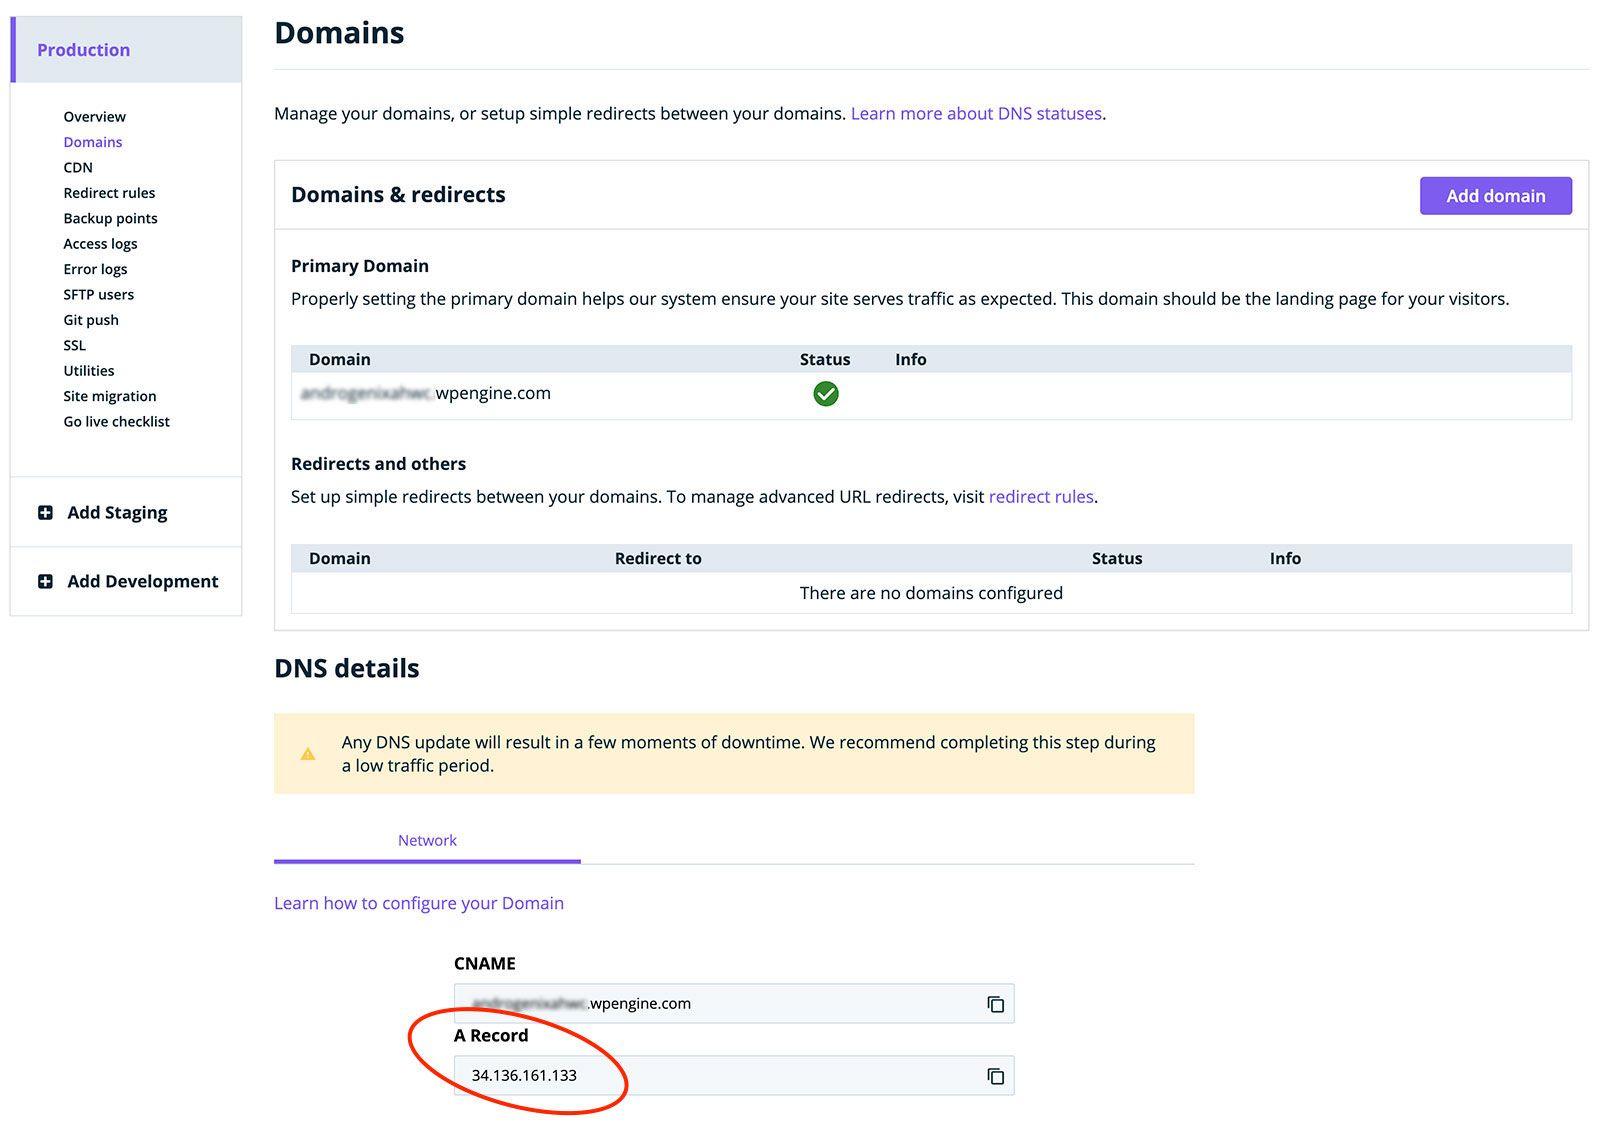 Domains Tab: A Record